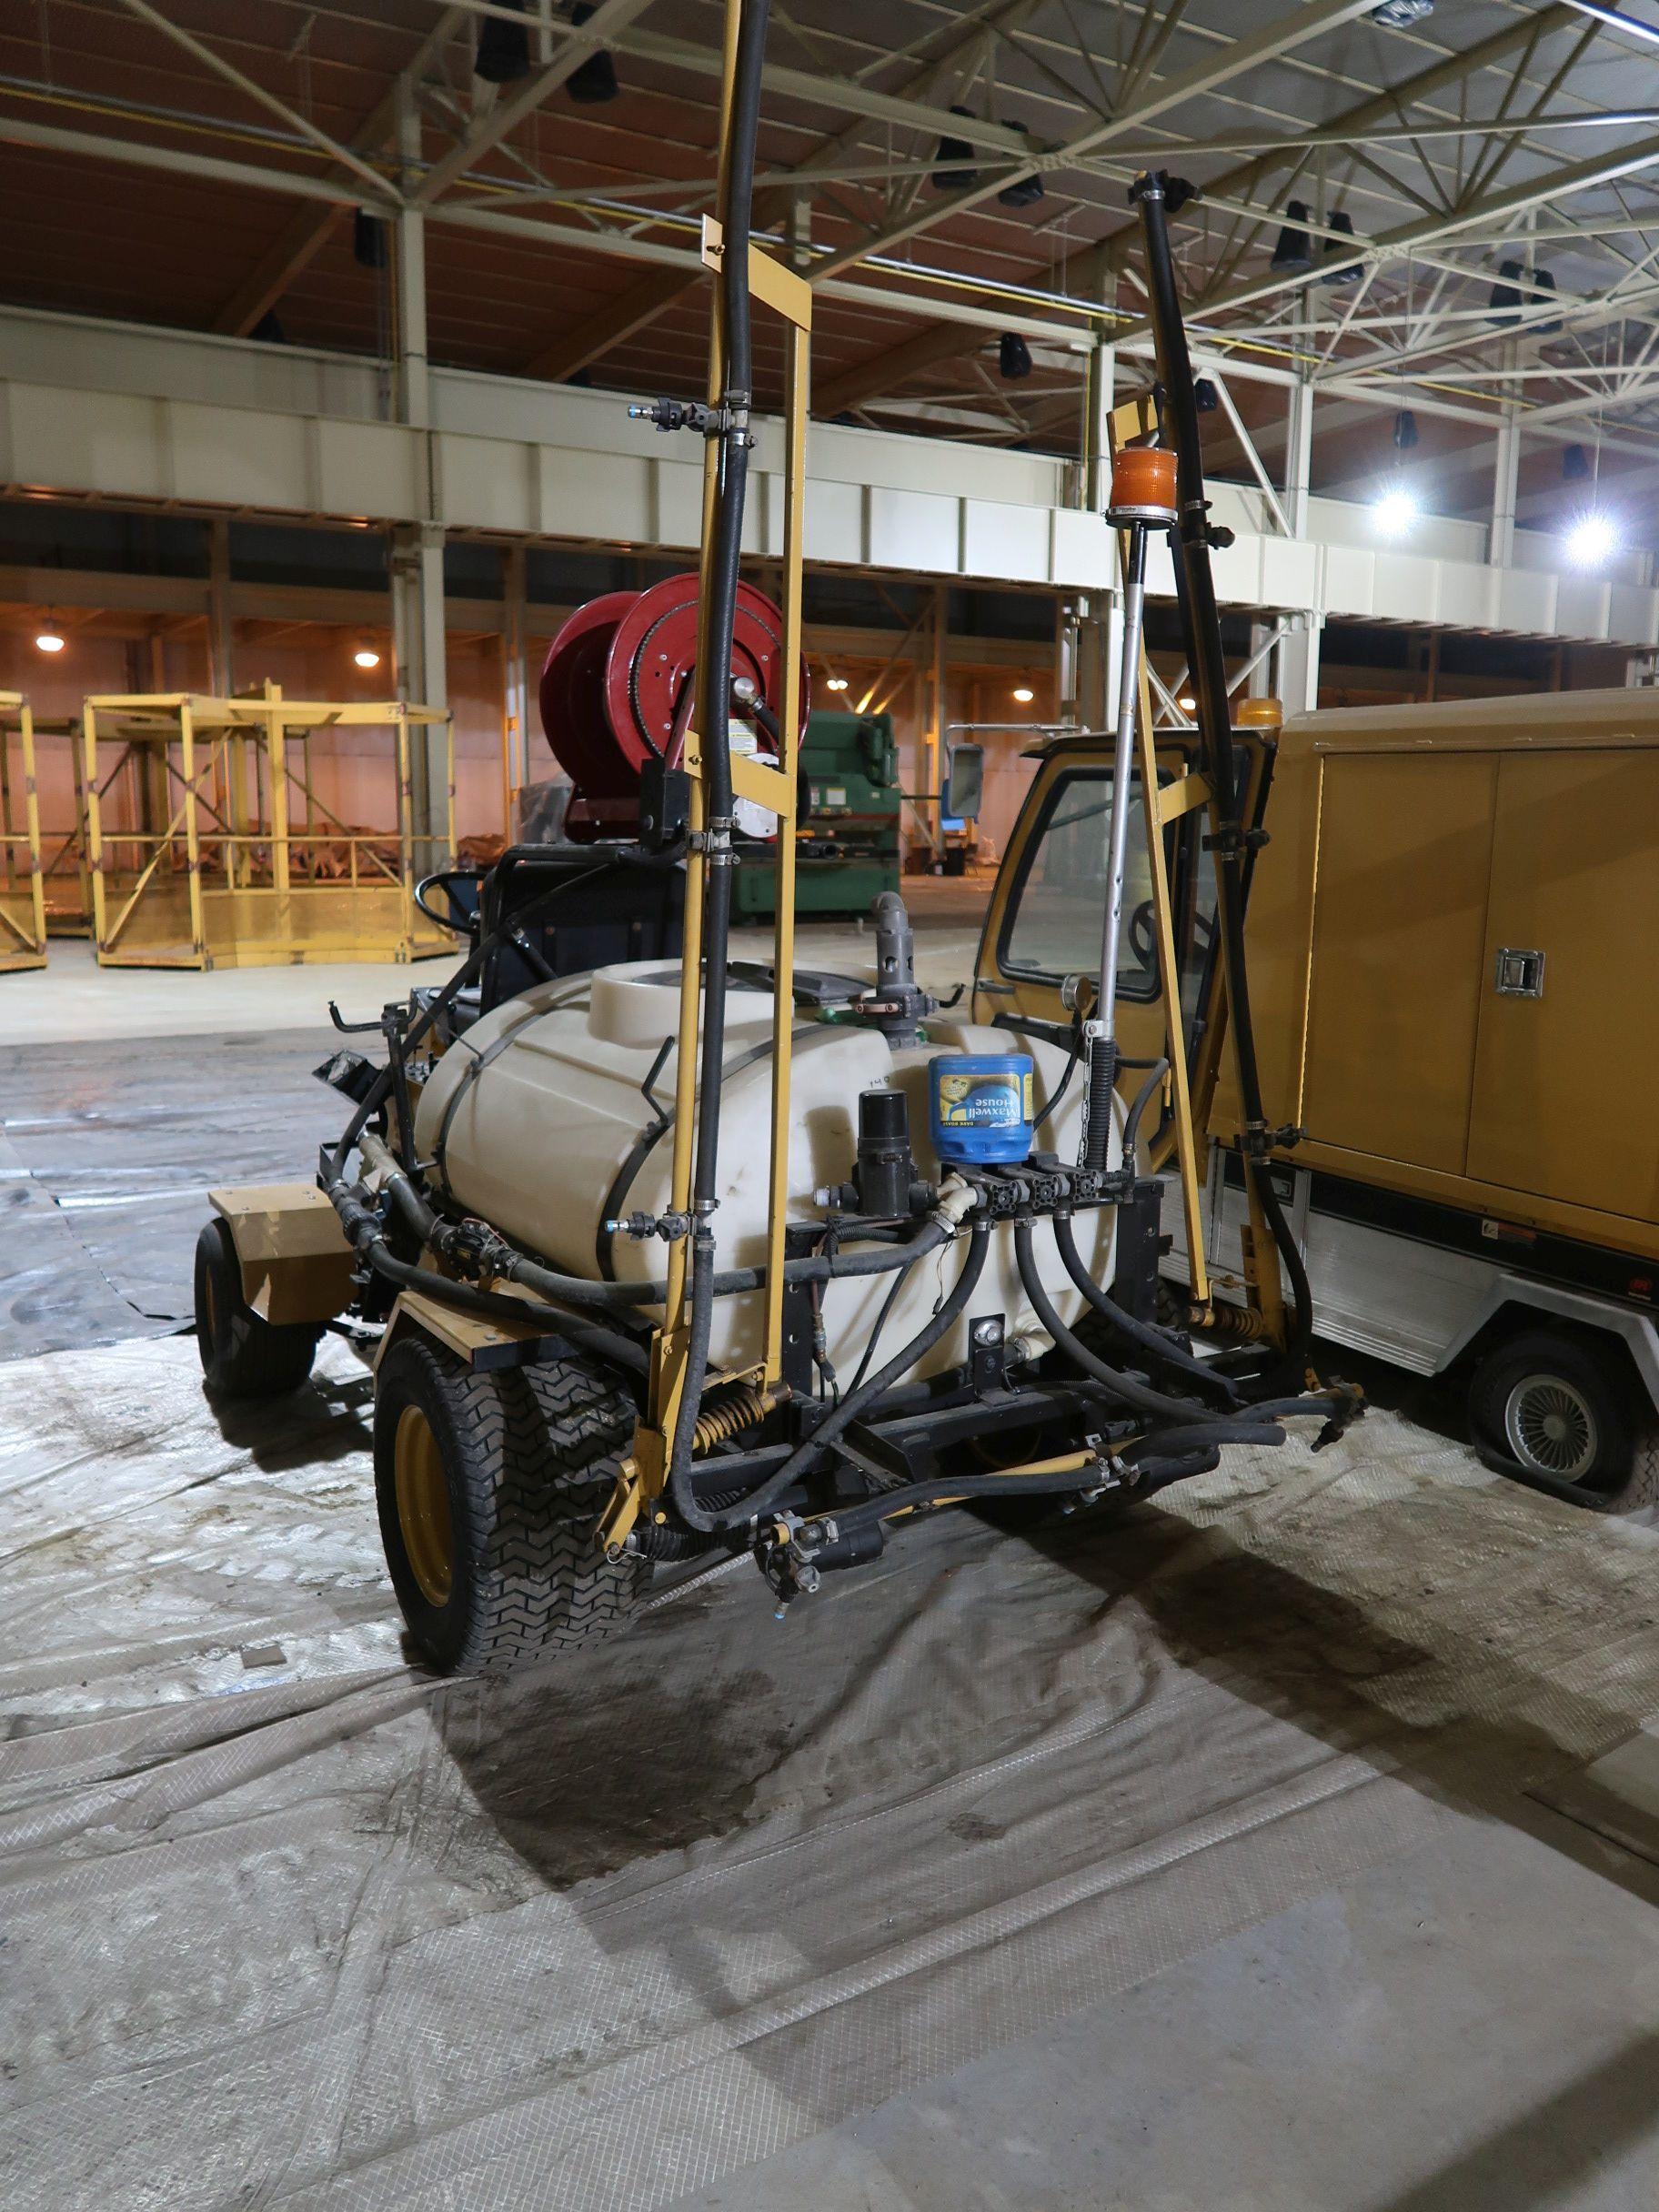 Lot 571 - TORO MODEL 41105 MULTI-PRO 1100 GASOLINE POWERED RIDE ON SPRAYER; S/N 30336, 16' BOOM, 3-SPEED,